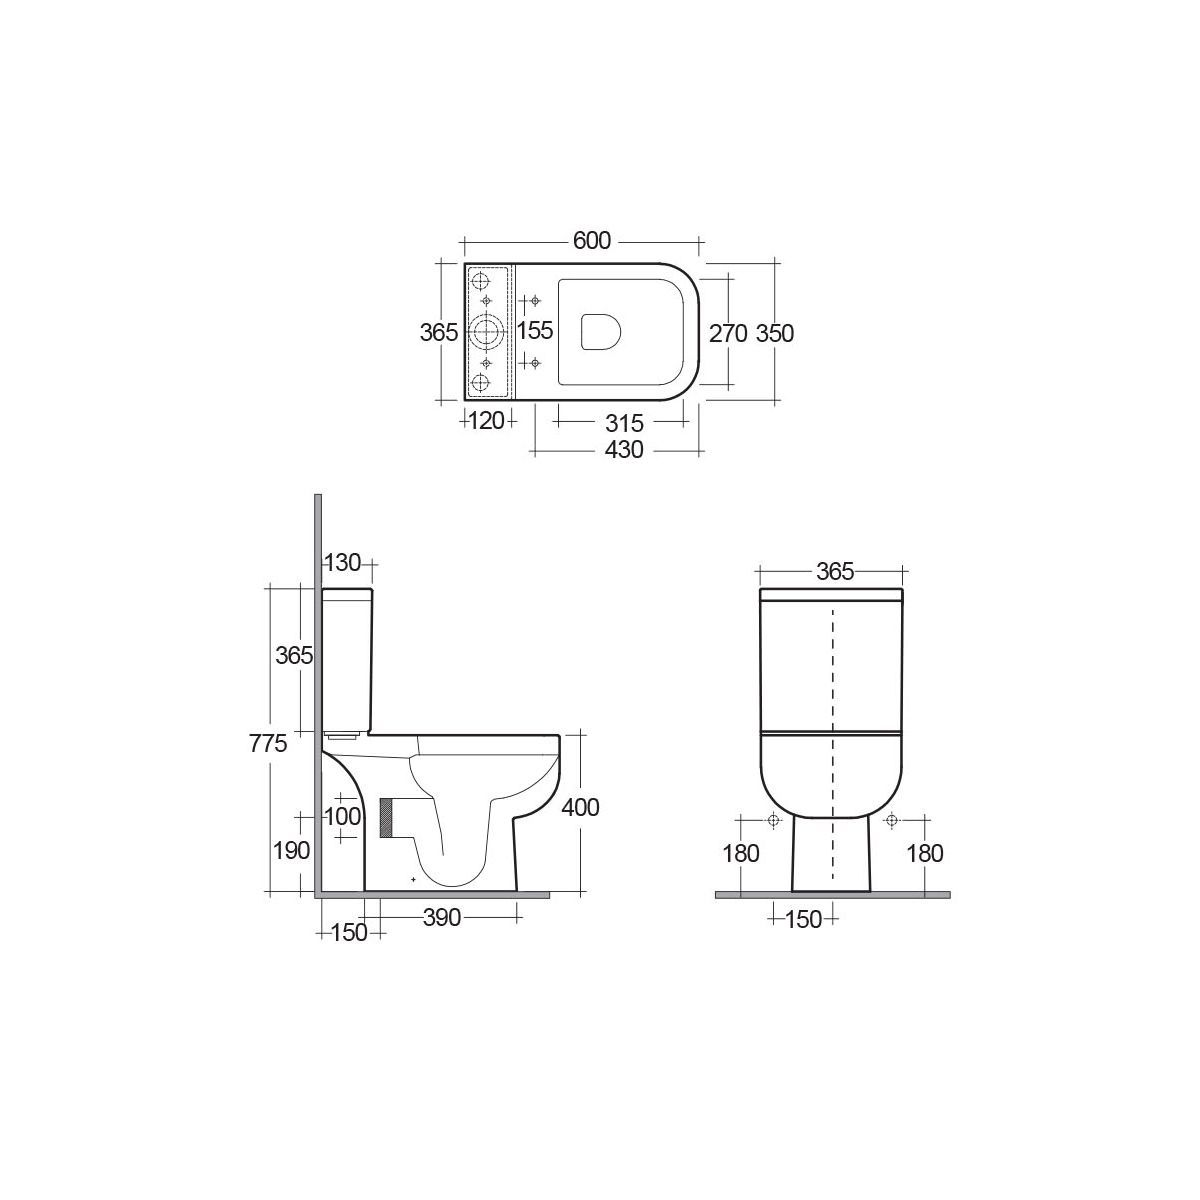 RAK Series 600 Short Projection Toilet Dimensions